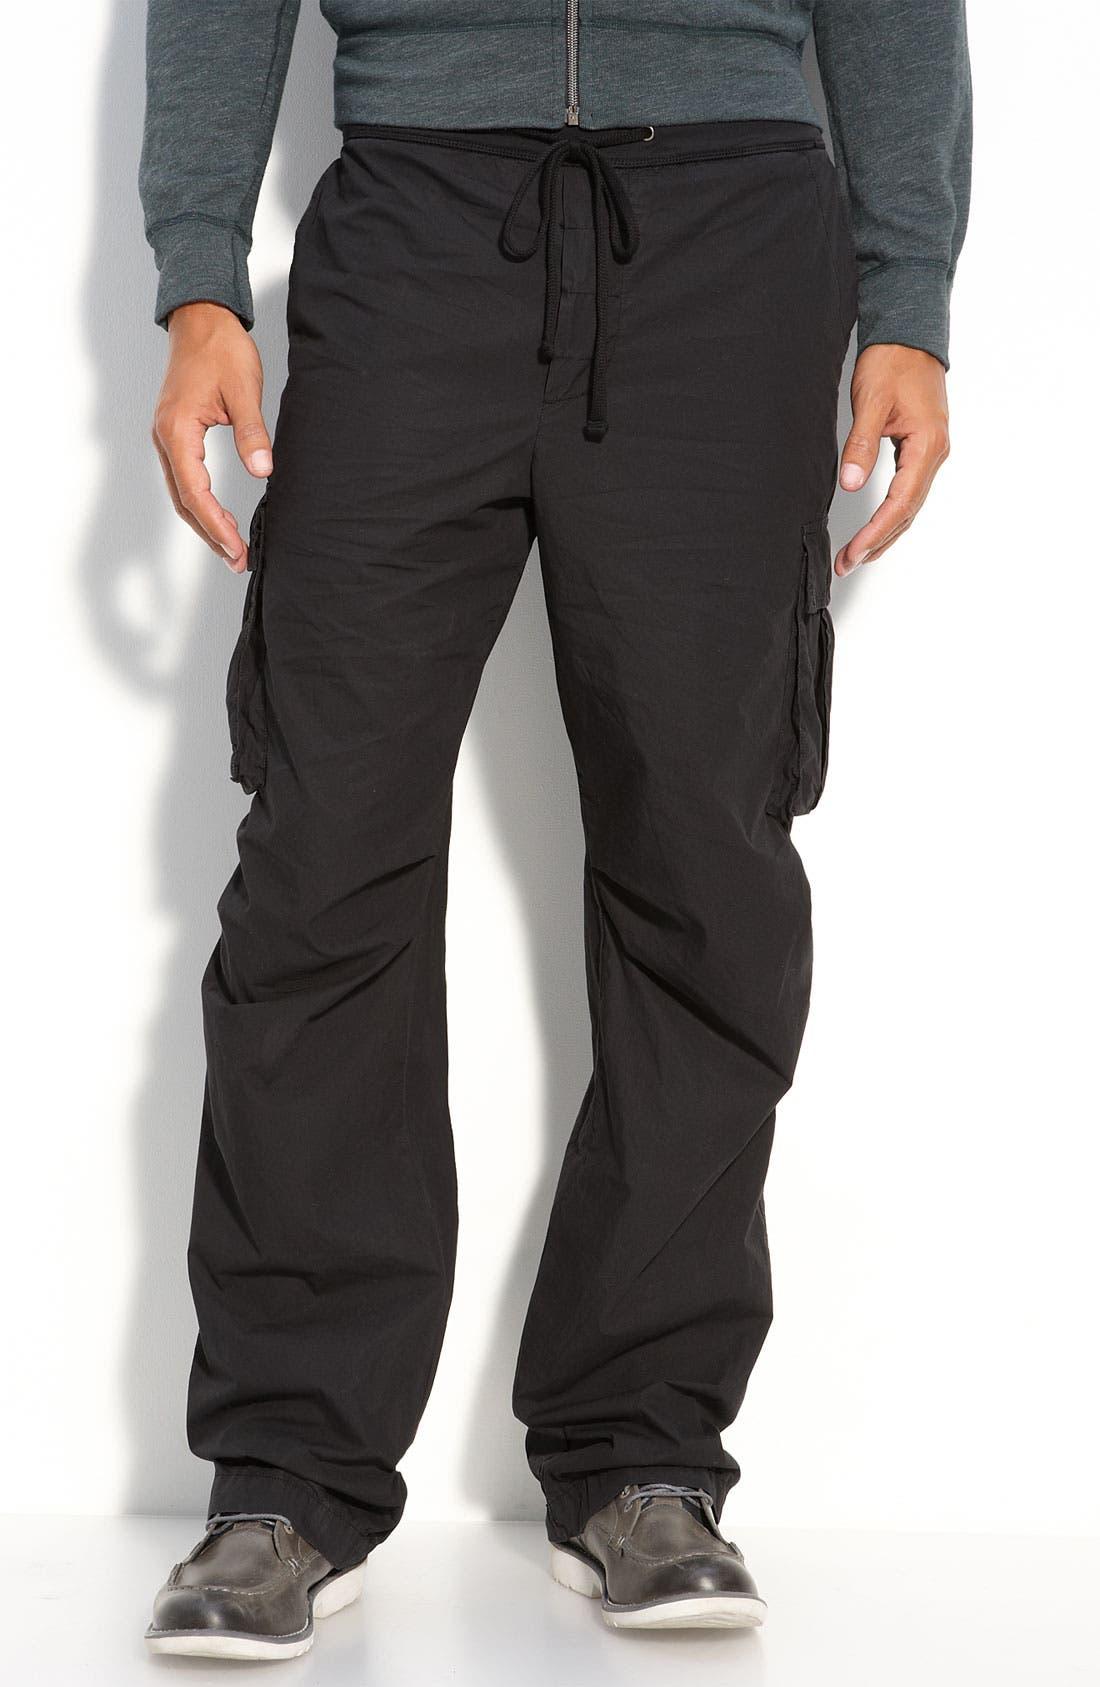 JAMES PERSE Drawstring Cargo Pants, Main, color, 004